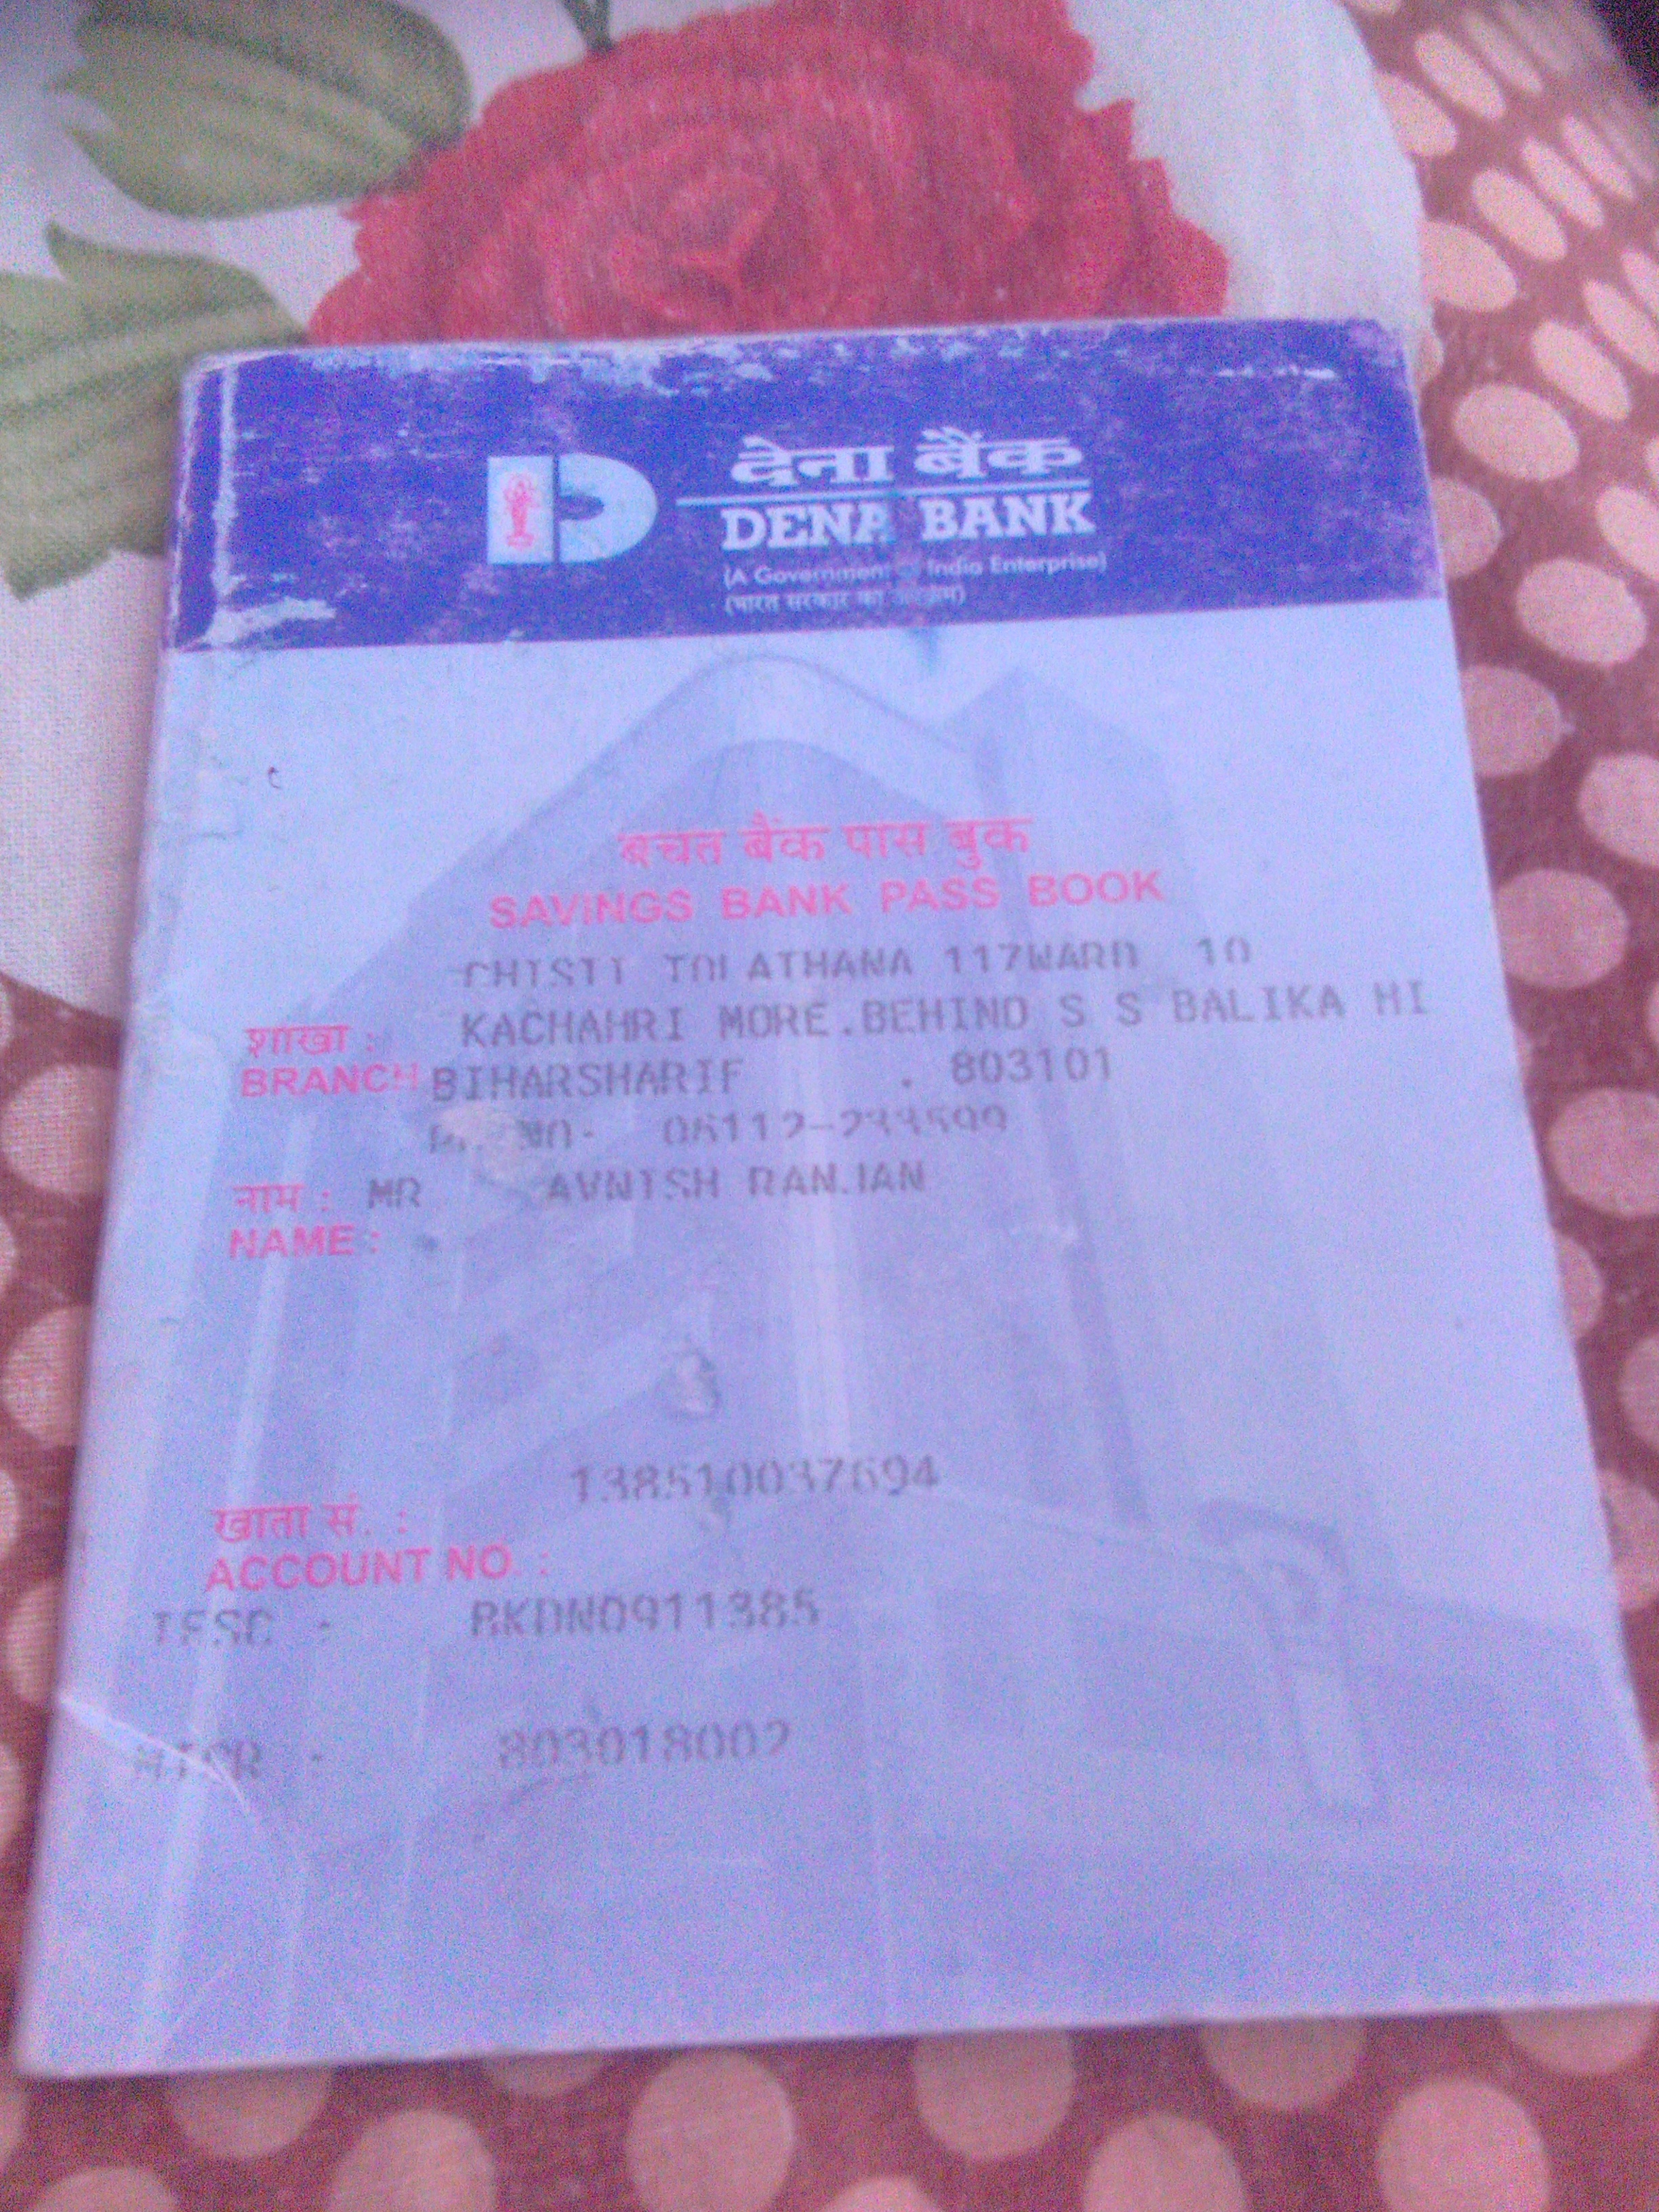 dena bank - not good service